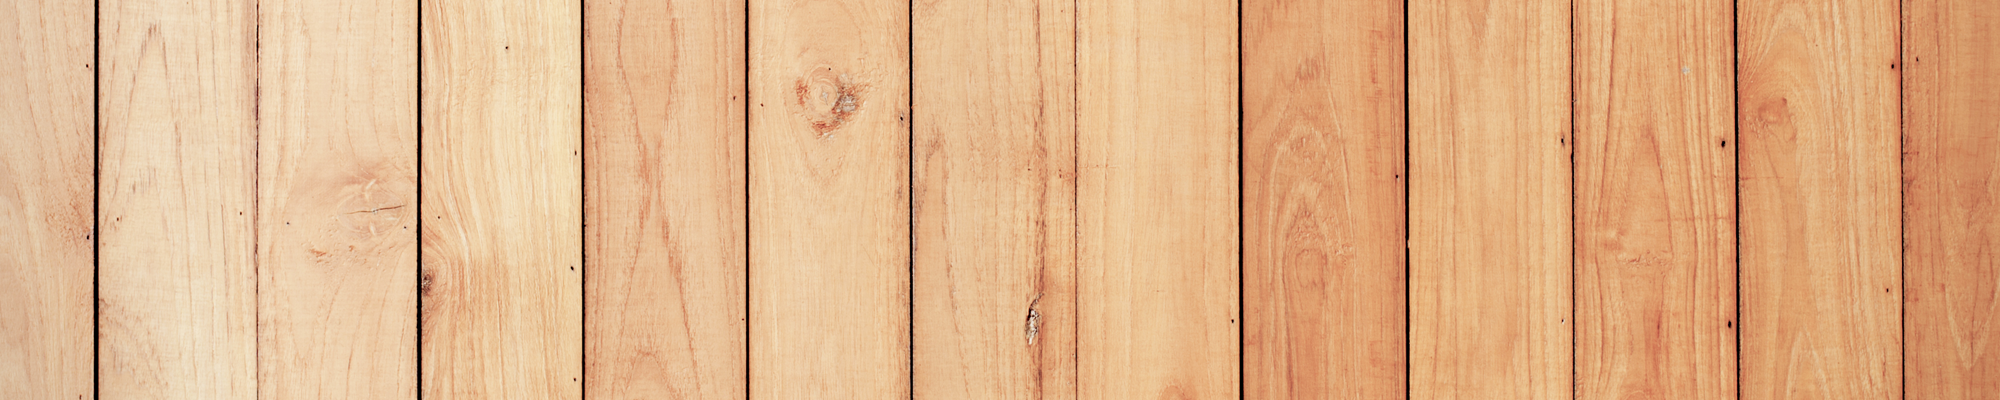 Vinyl fencing wood fence privacy fence warren mi baanklon Gallery